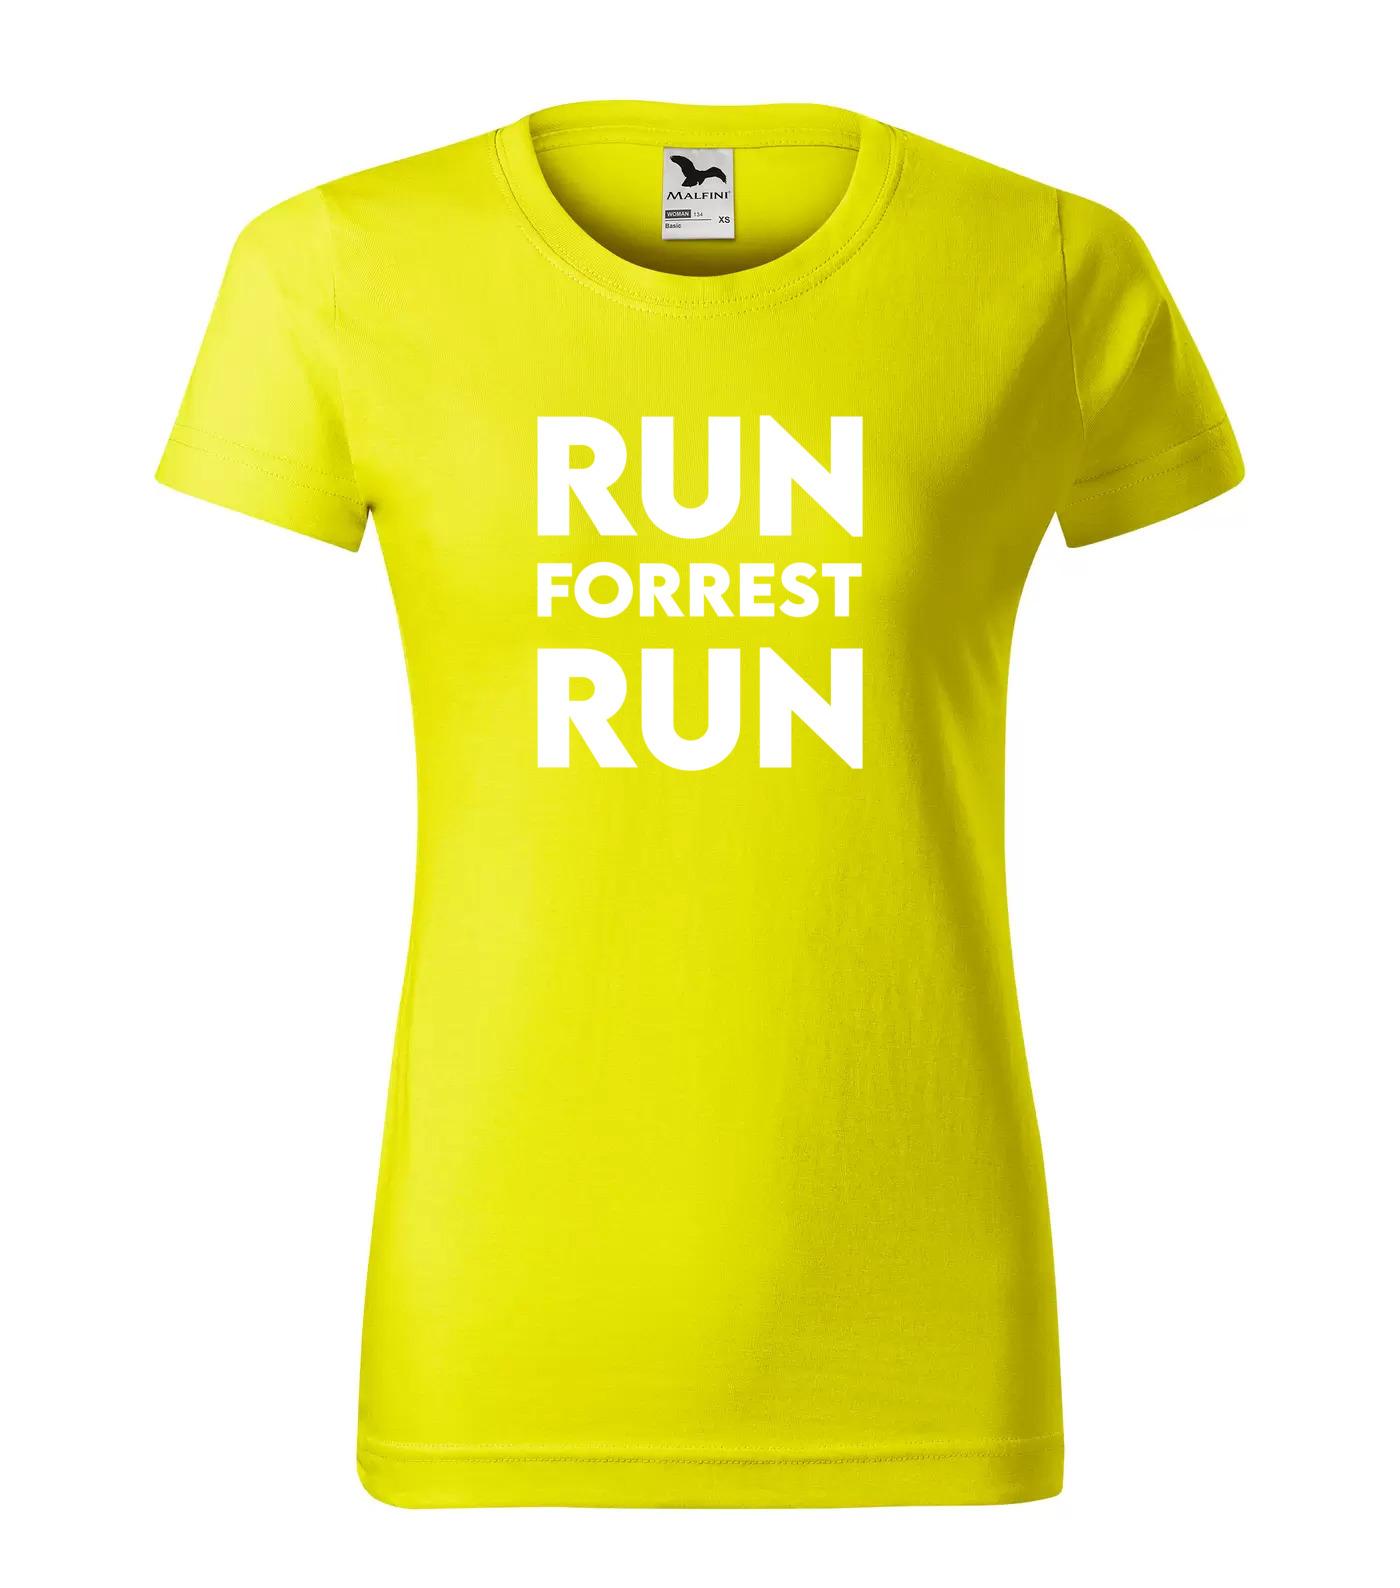 Tričko Filmové hlášky Run Forrest Run Inverse